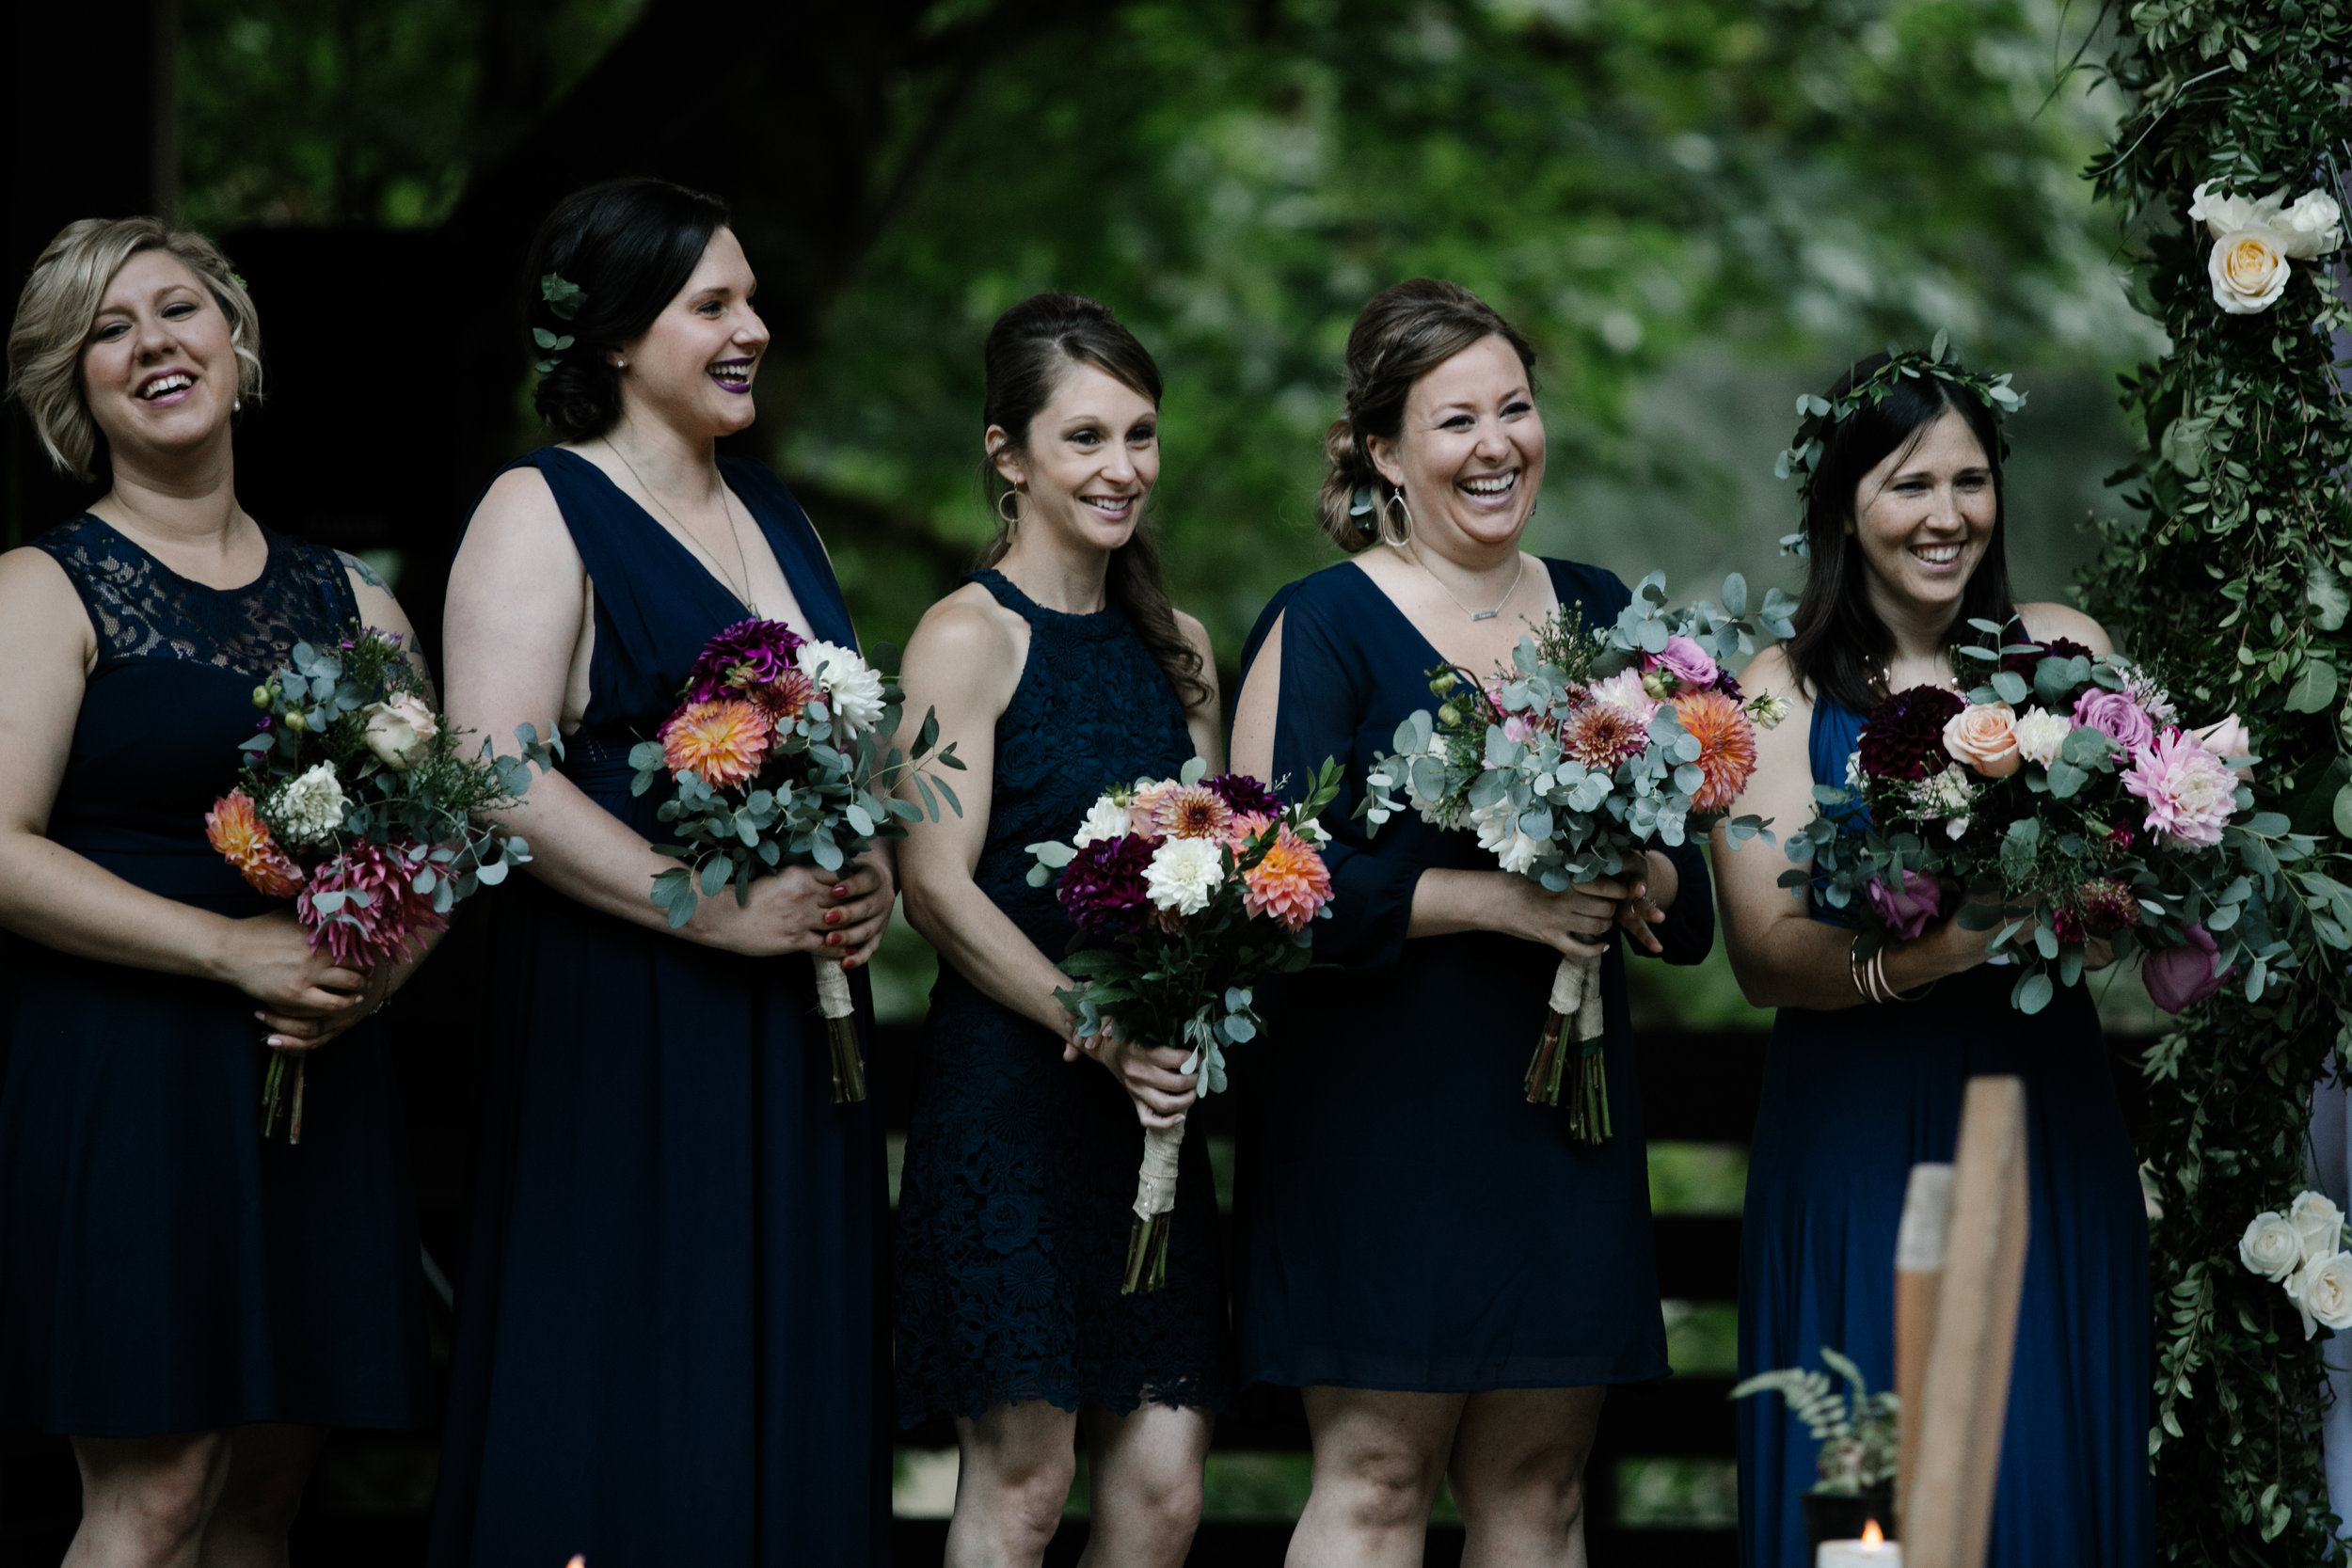 Sevlynn-Photography-Teresa-Chandler-Wedding-51.jpg